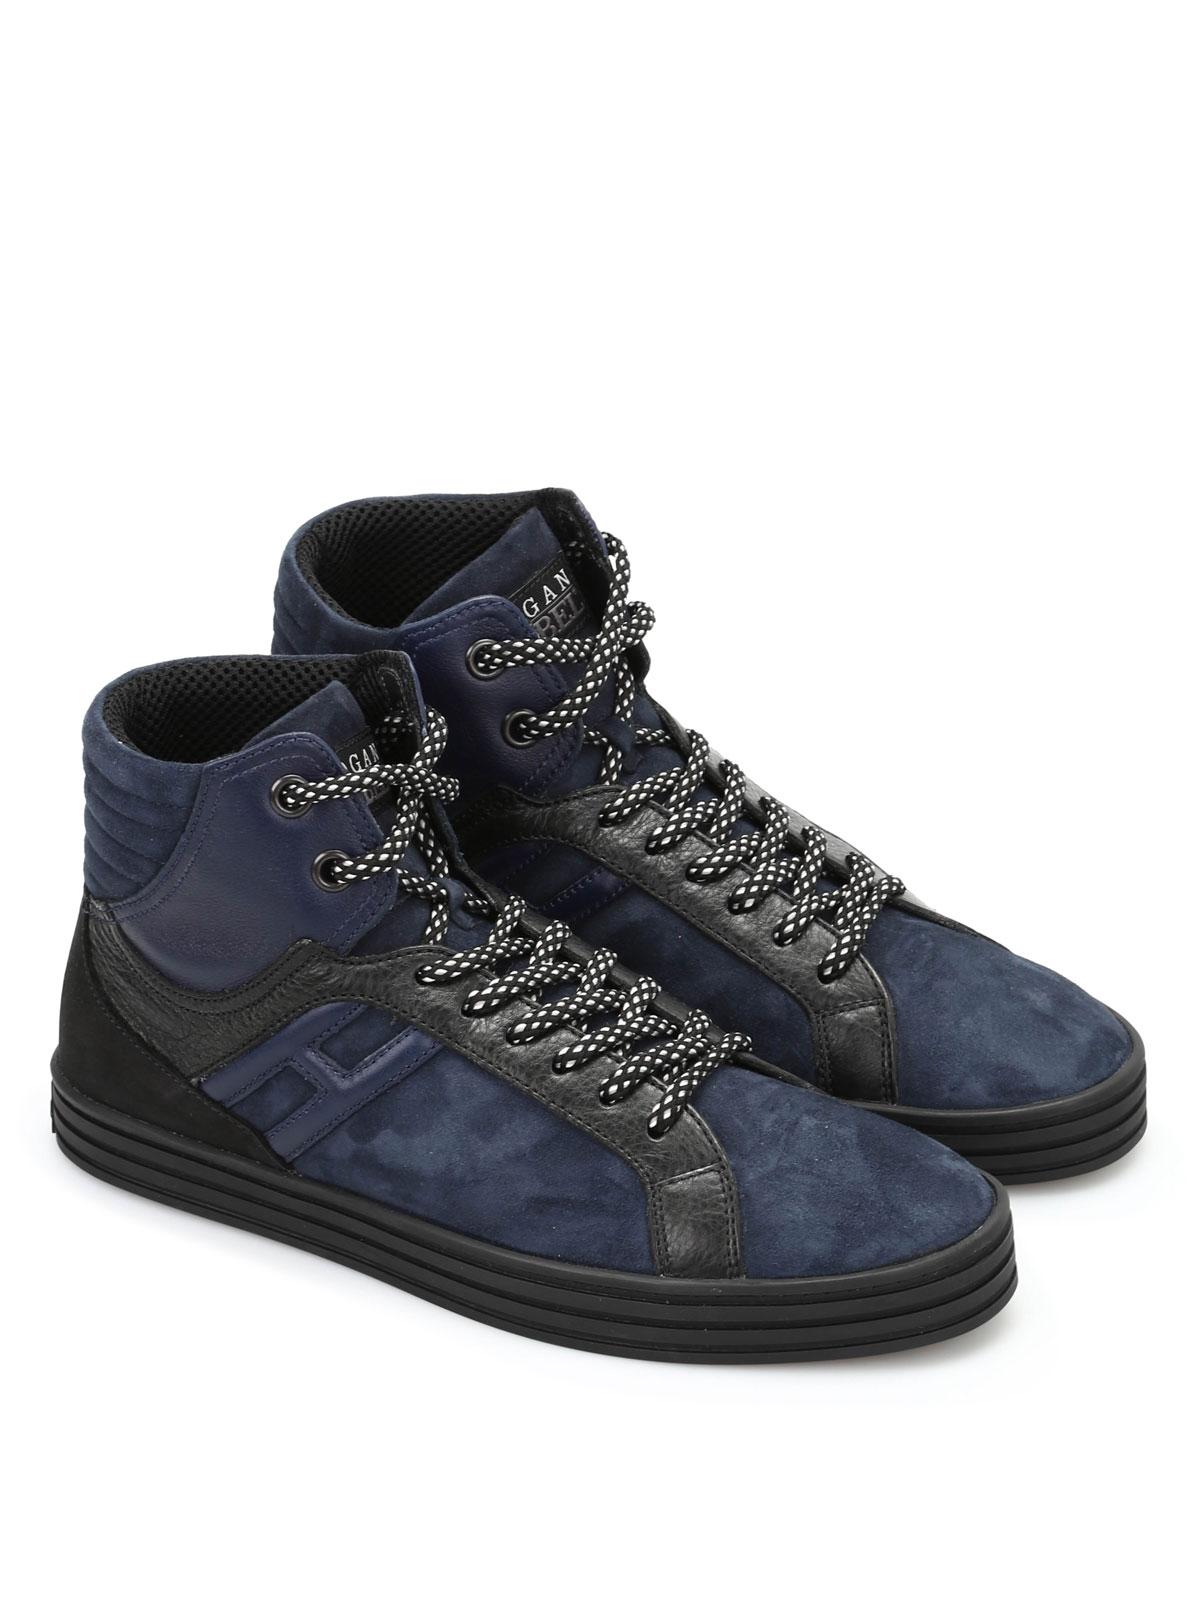 Hogan Rebel - R141 Basket - sneakers - HXM1410R283DWH0XD5  02ea4ffa17f